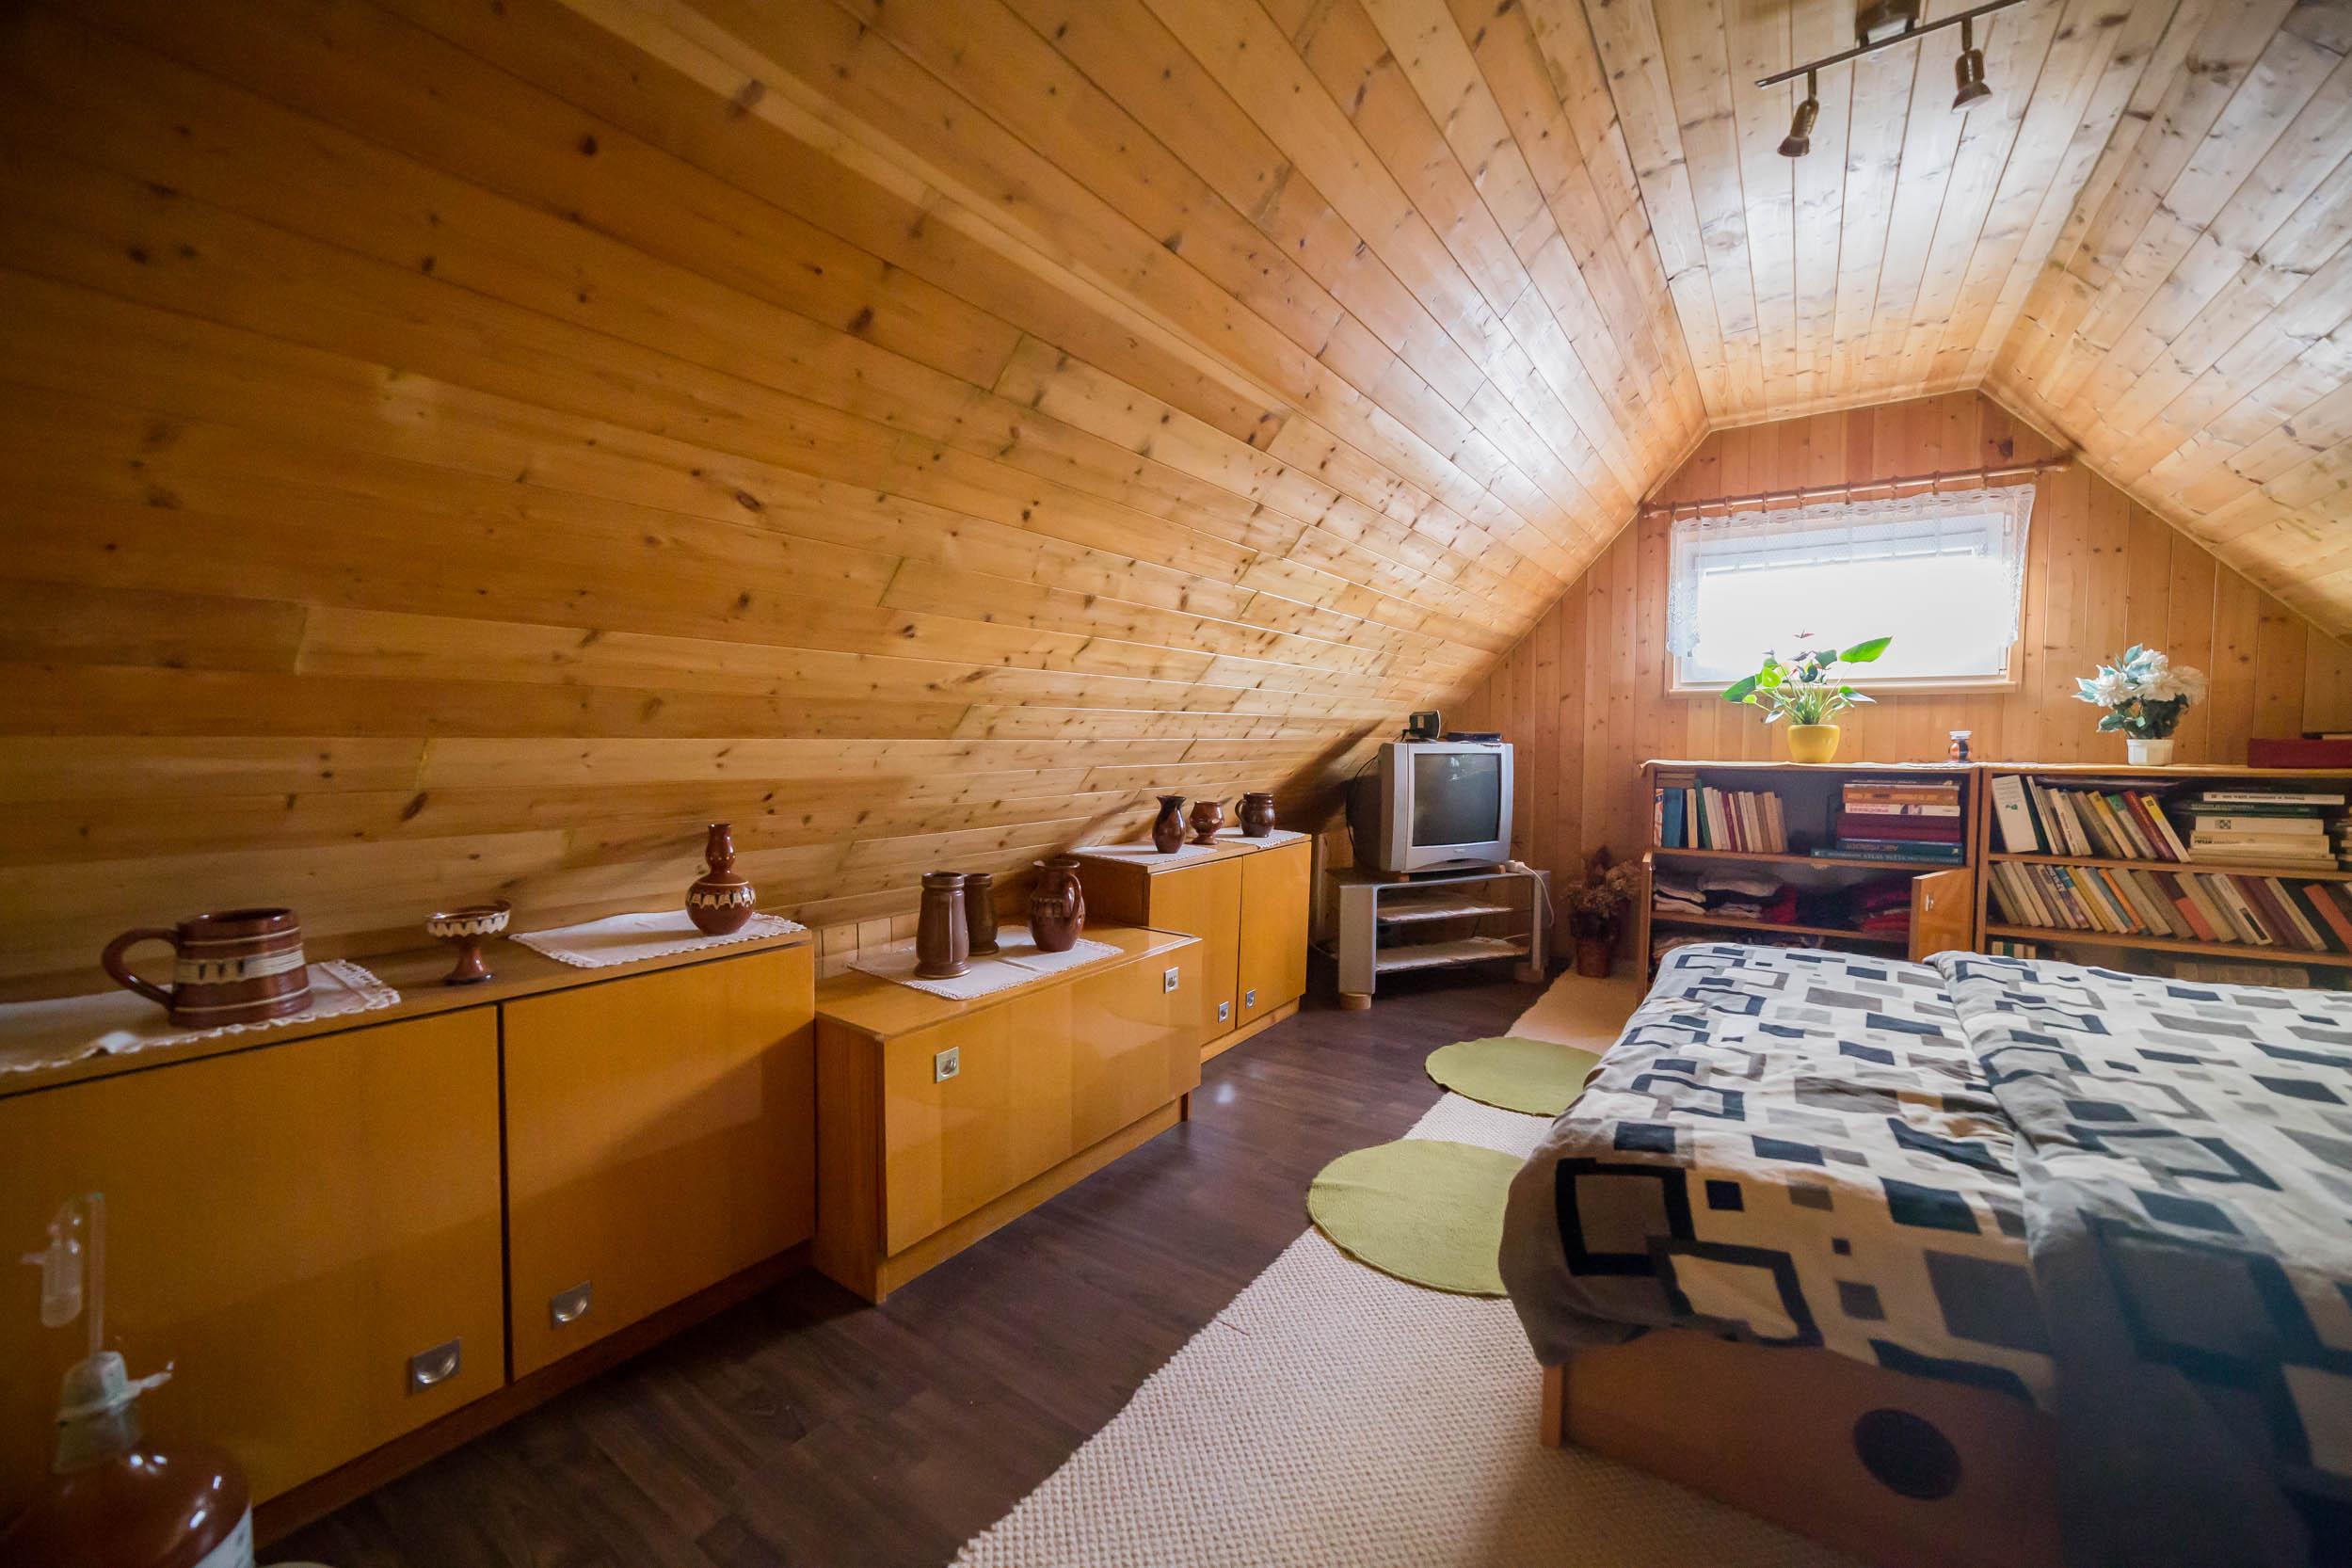 opava reality dreveny strop okno postel skrin televize kniha koberec kvetina